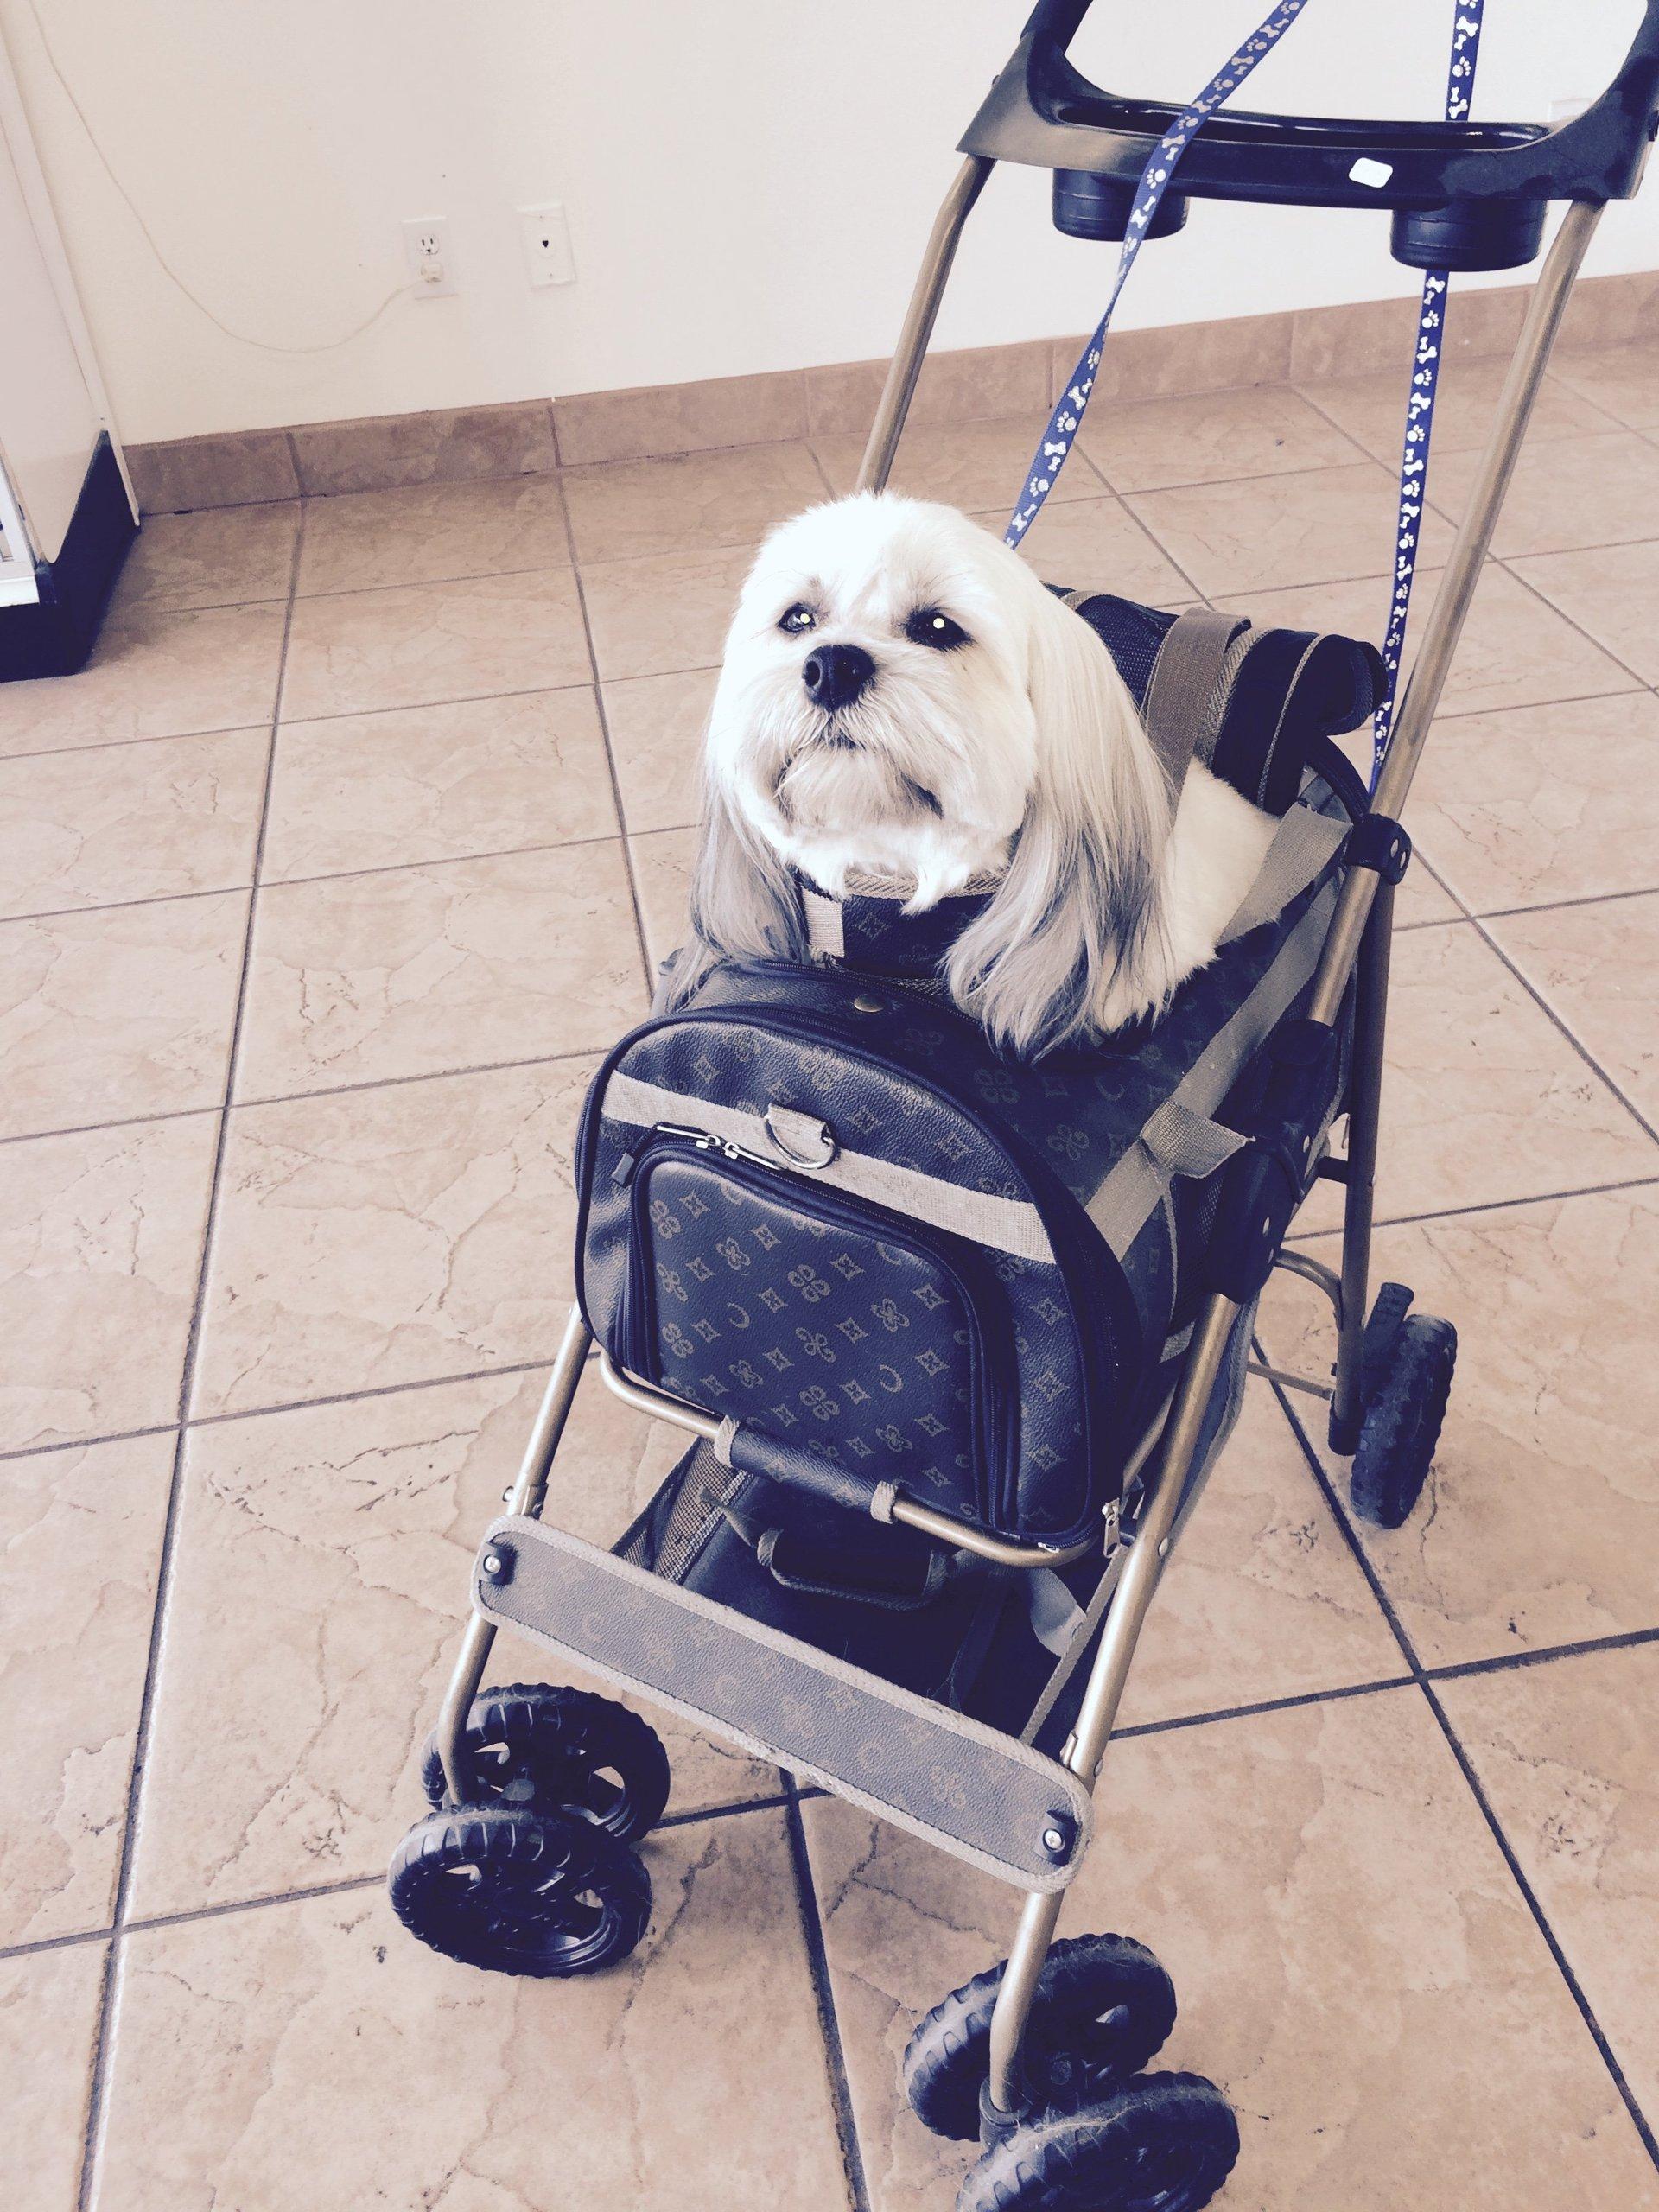 dog inside stroller